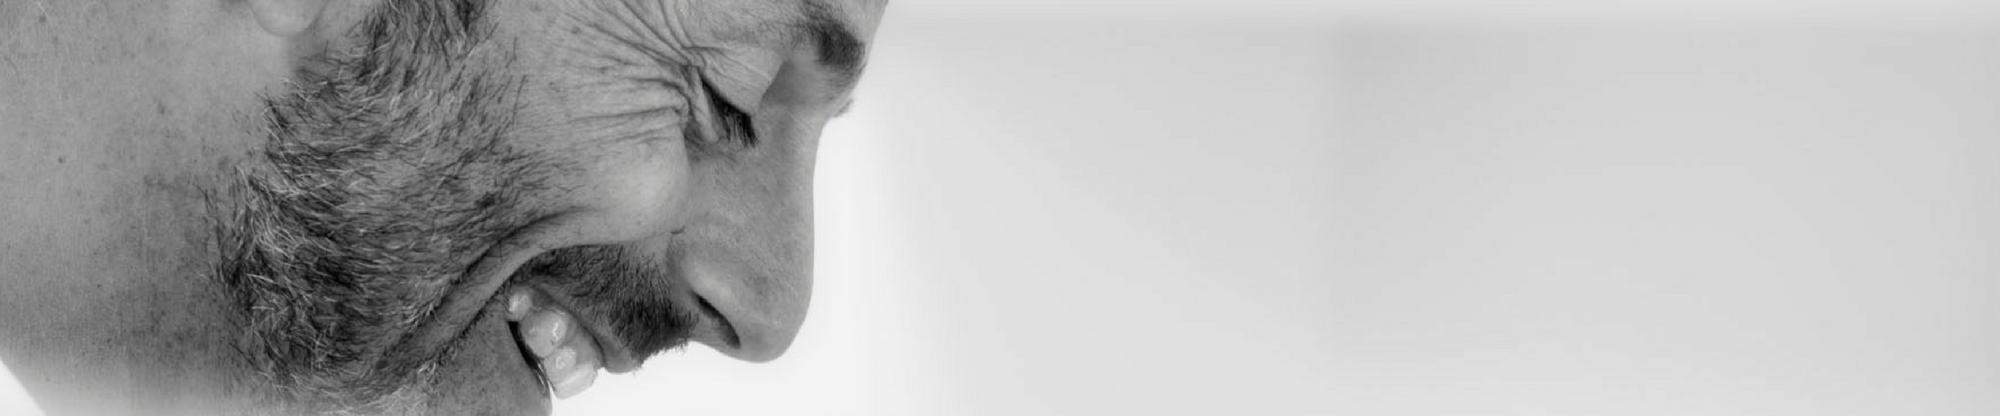 dentista-paura-ansiolisi-endovenosa